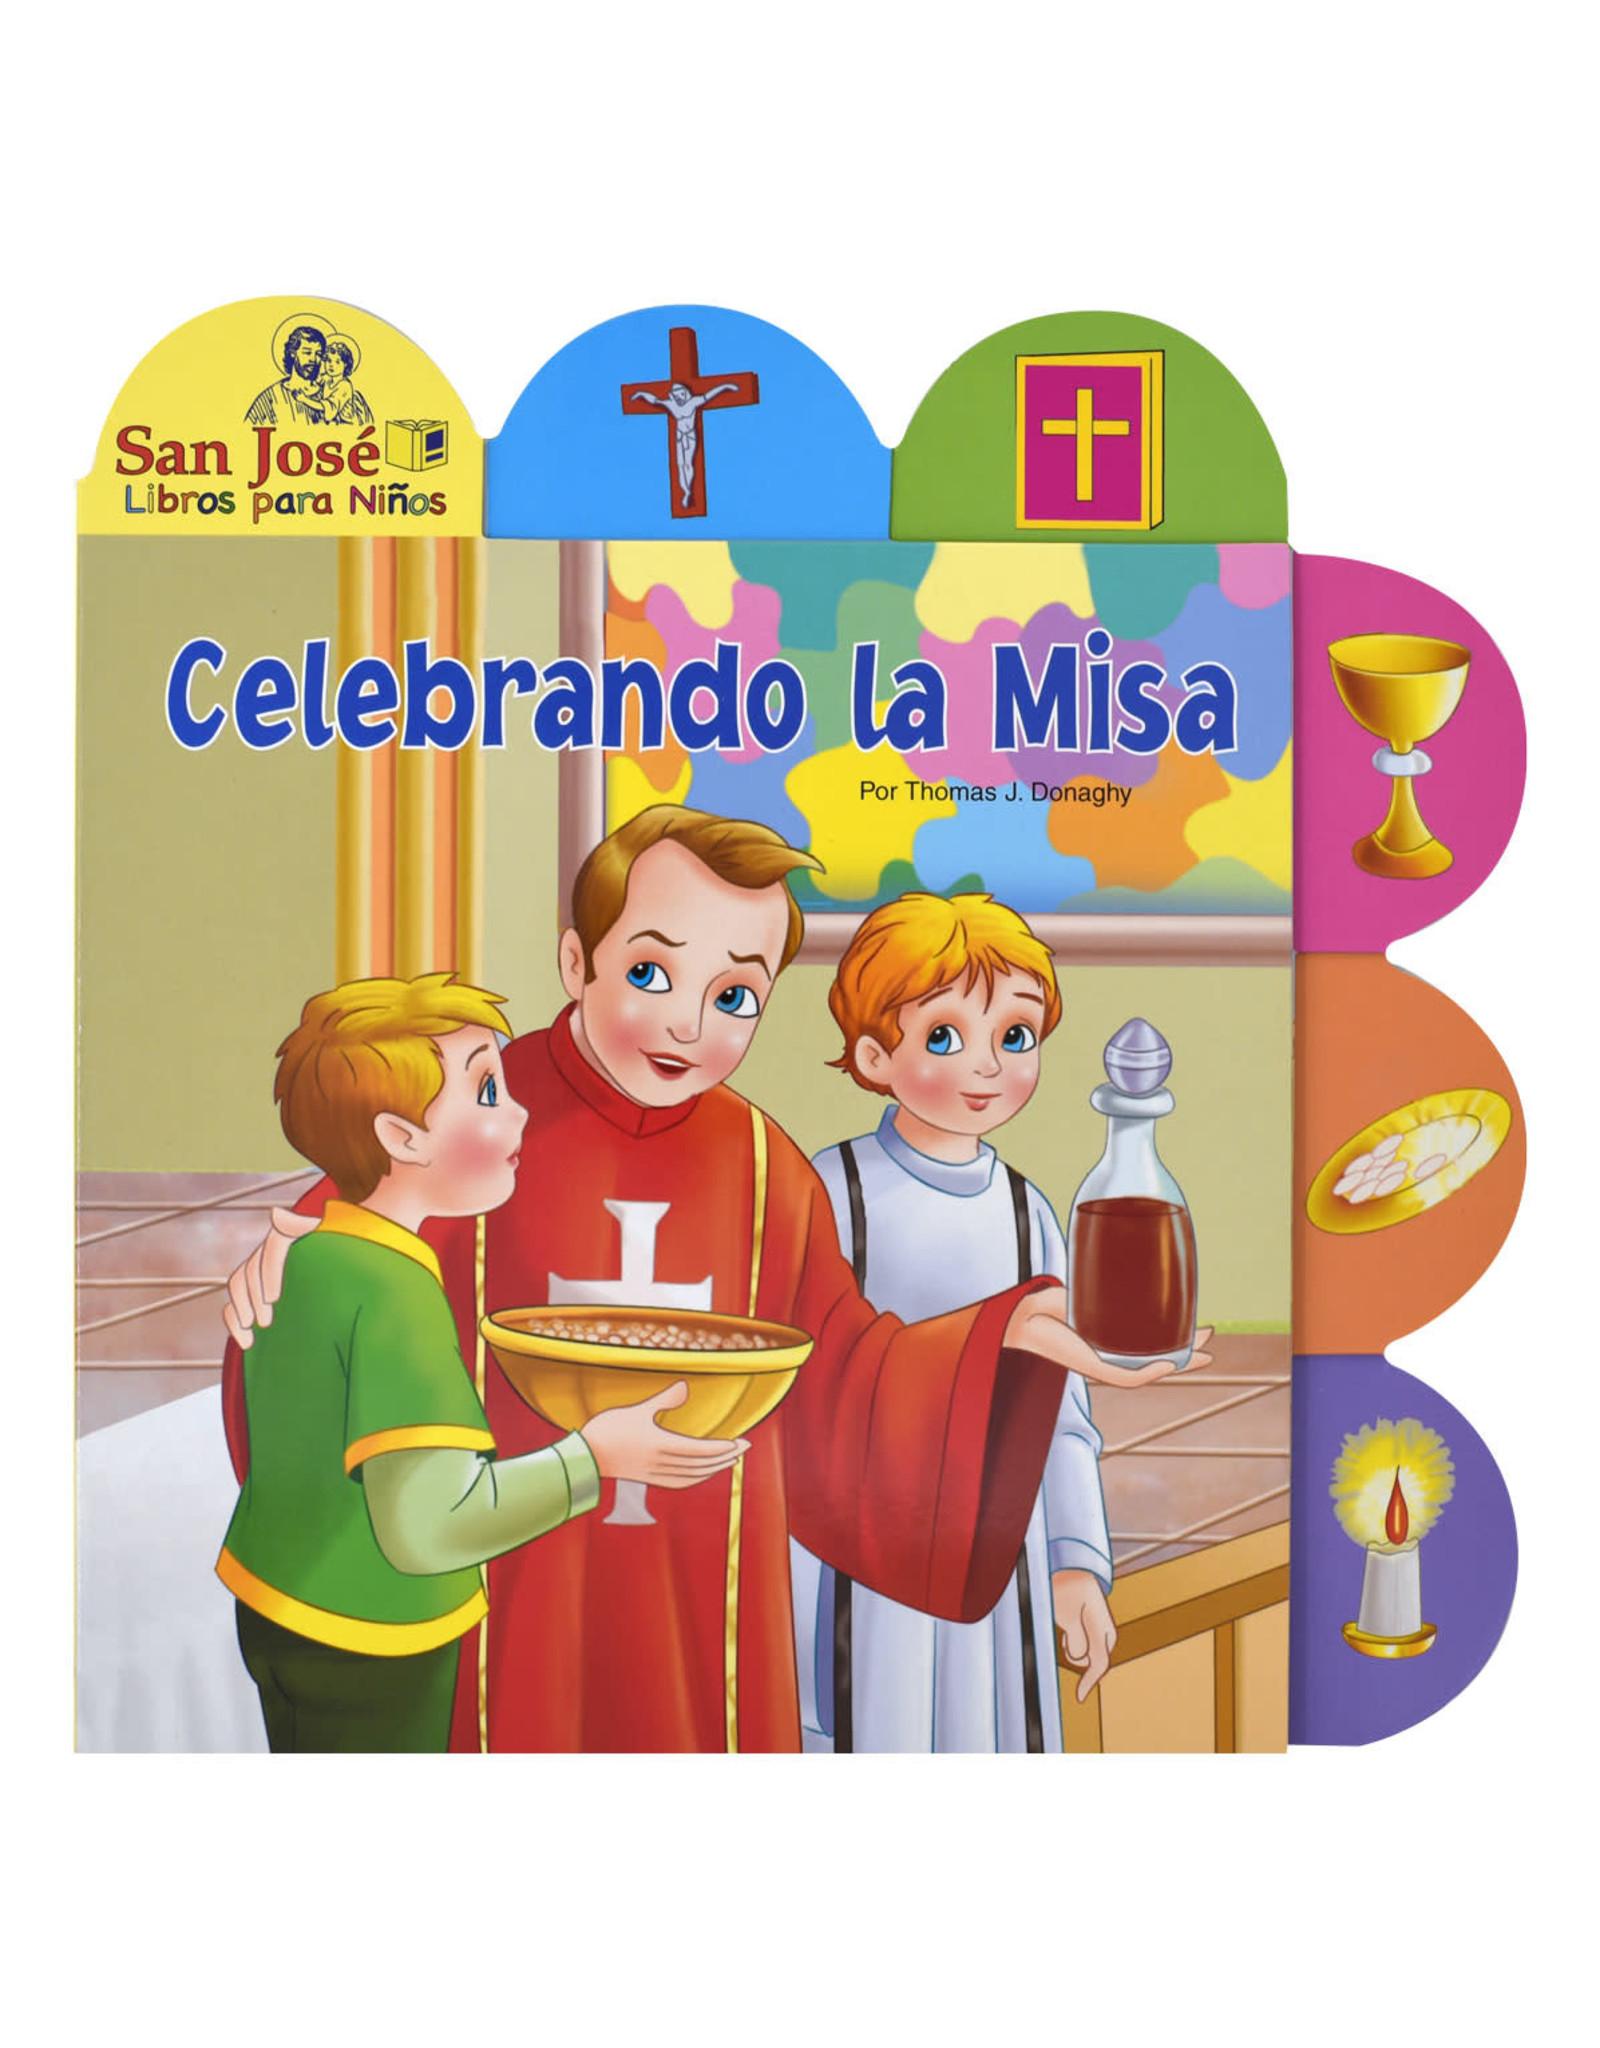 Celebrando la Misa (Celebrating Mass)